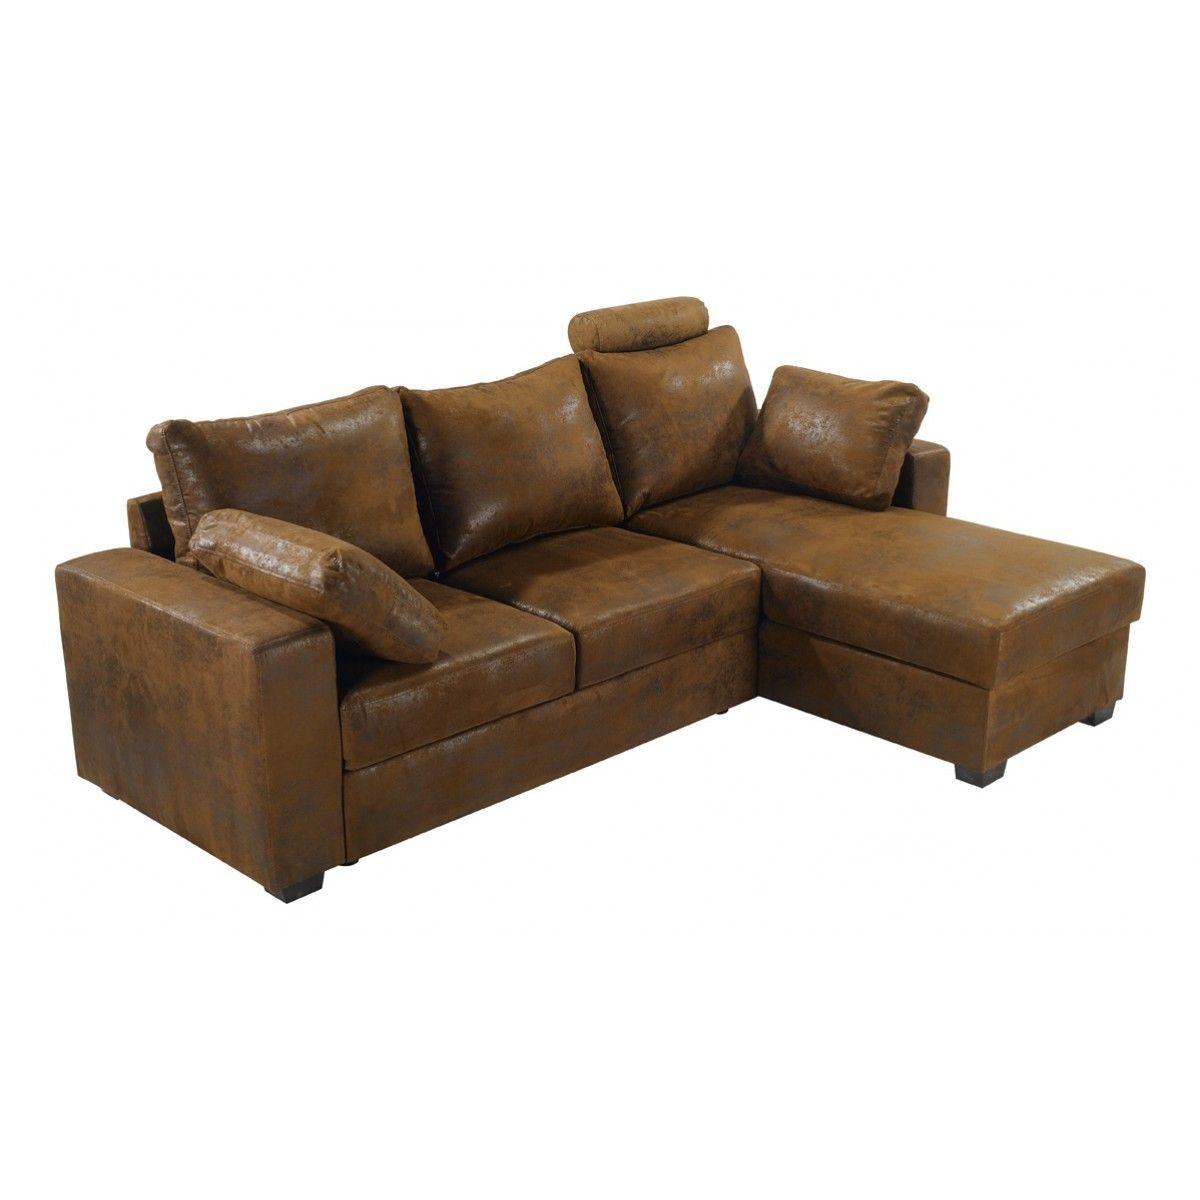 canap d 39 angle convertible microfibre chocolat oslo. Black Bedroom Furniture Sets. Home Design Ideas